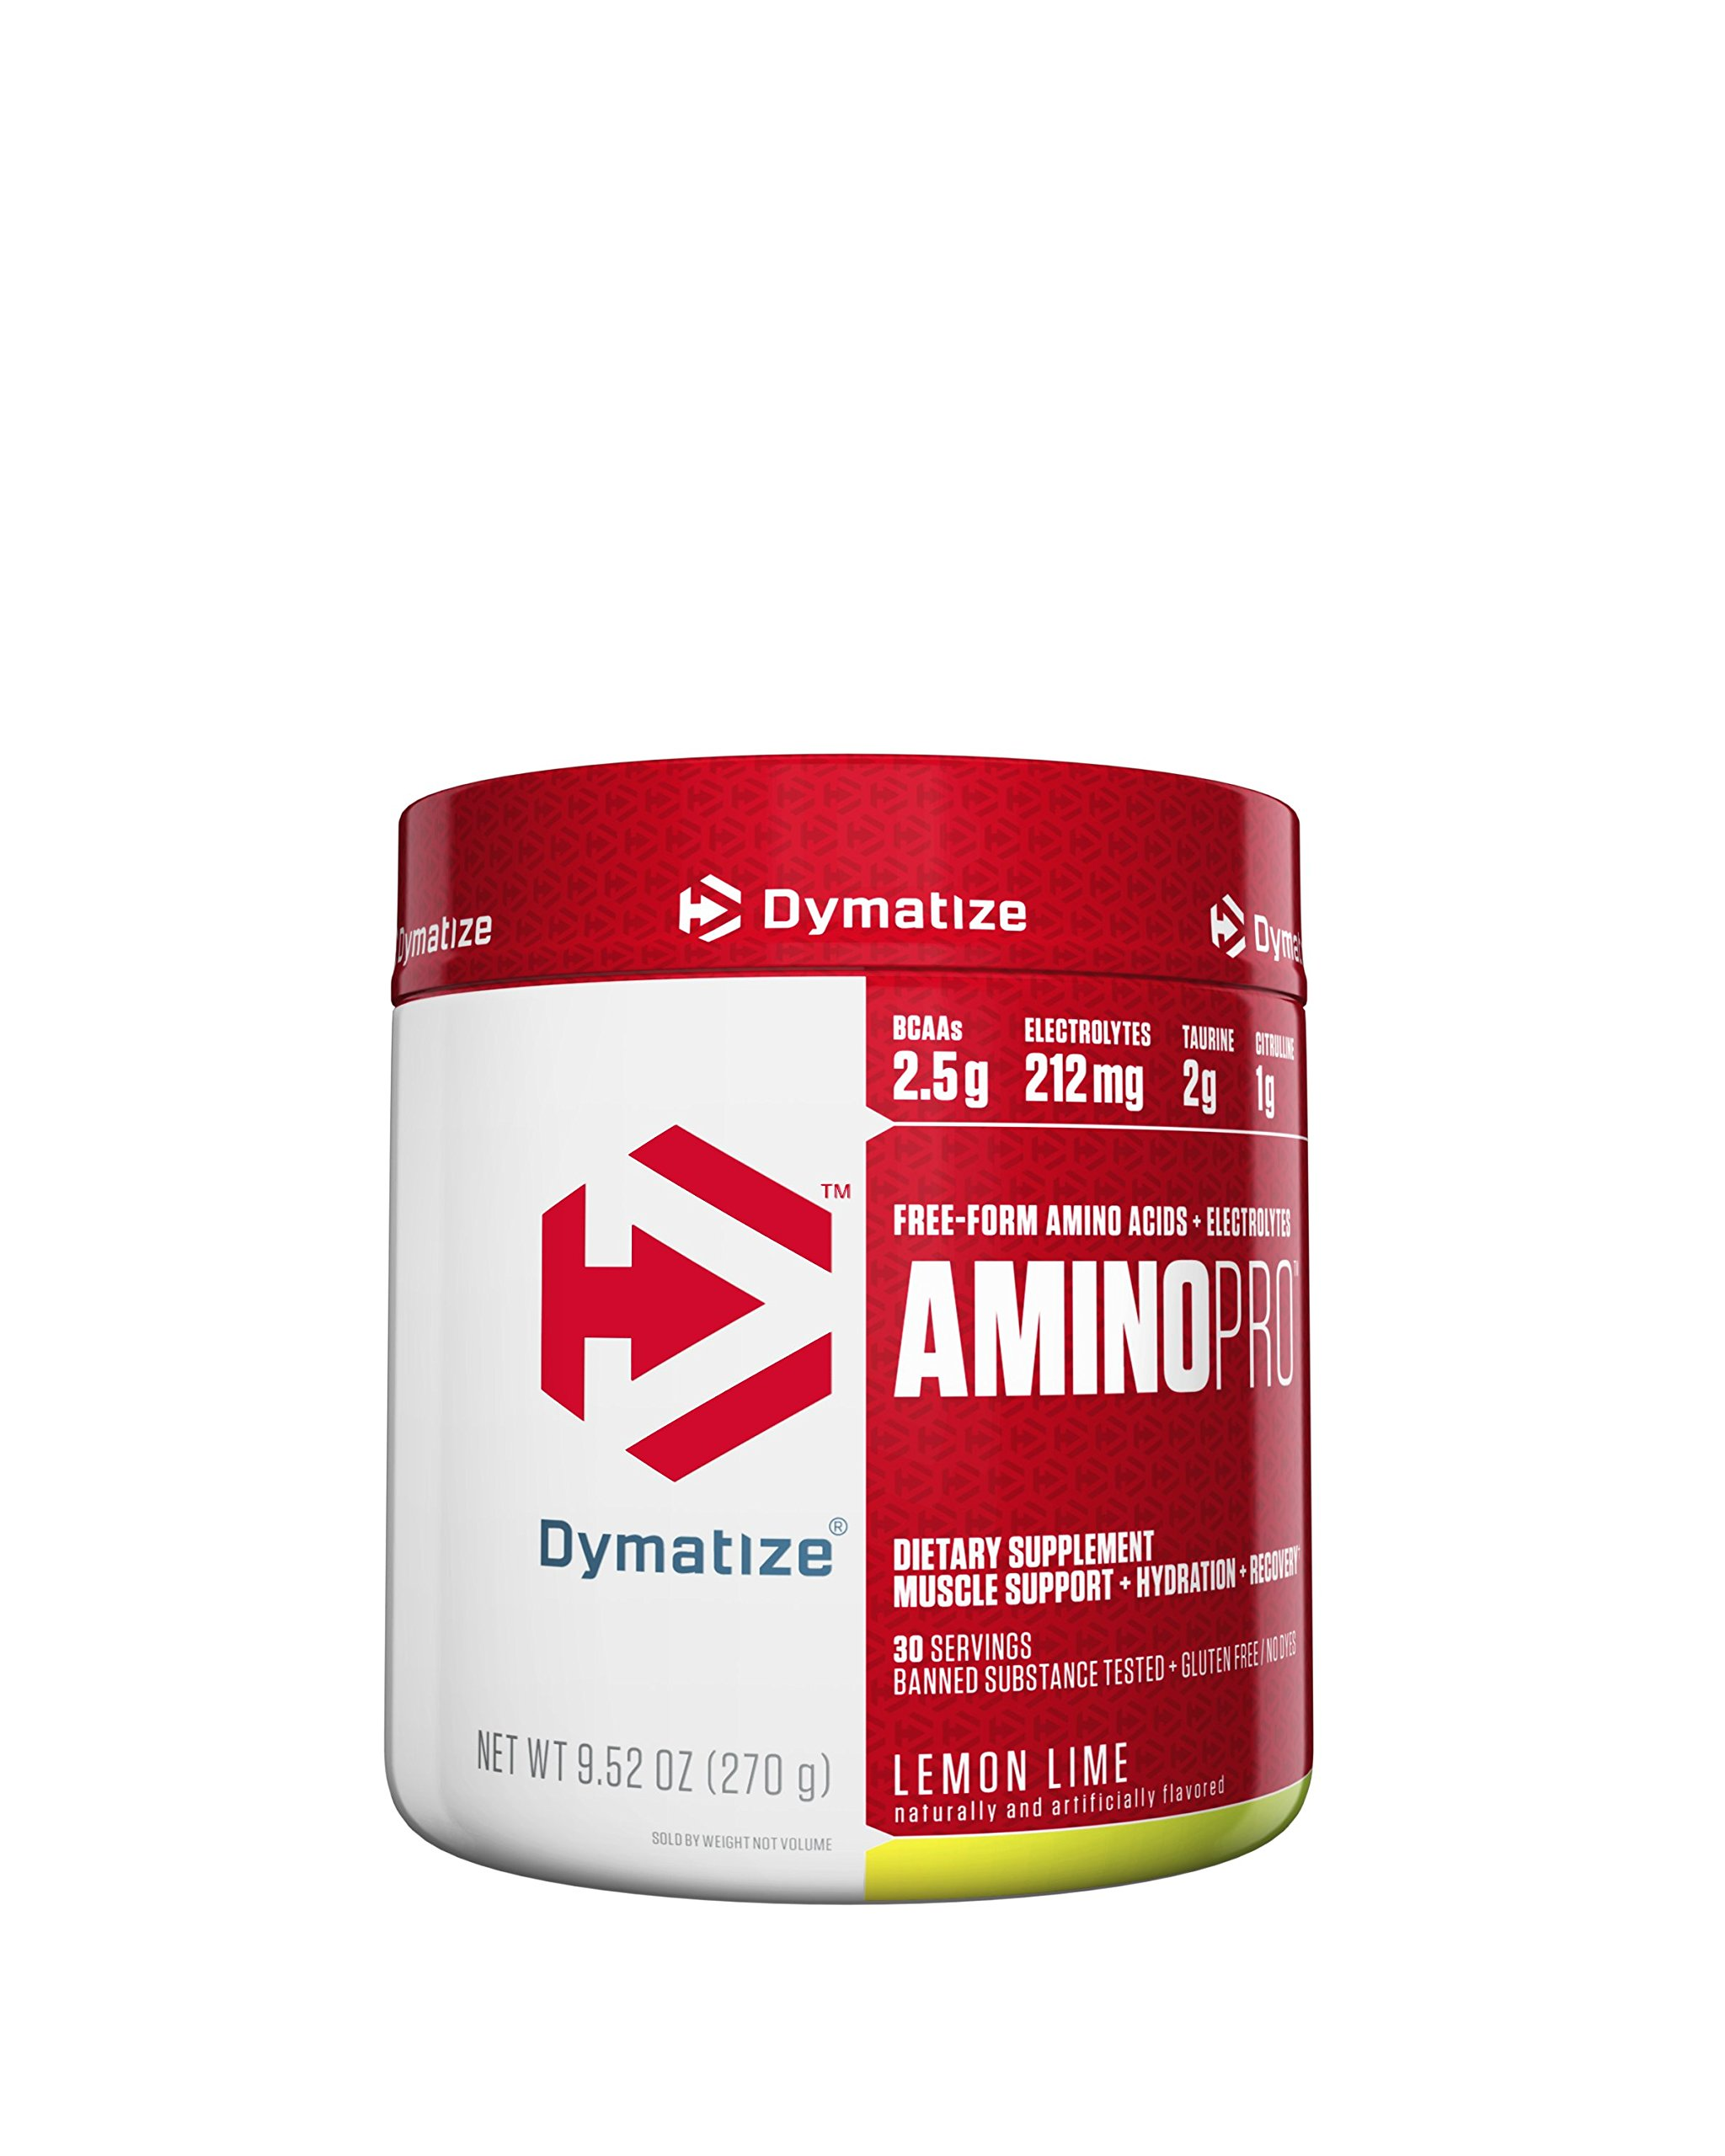 Dymatize AminoPro Endurance Amplifier Powder, Reinforced with Electrolytes & Amino Acids, Lemon Lime, 9.52 Ounce